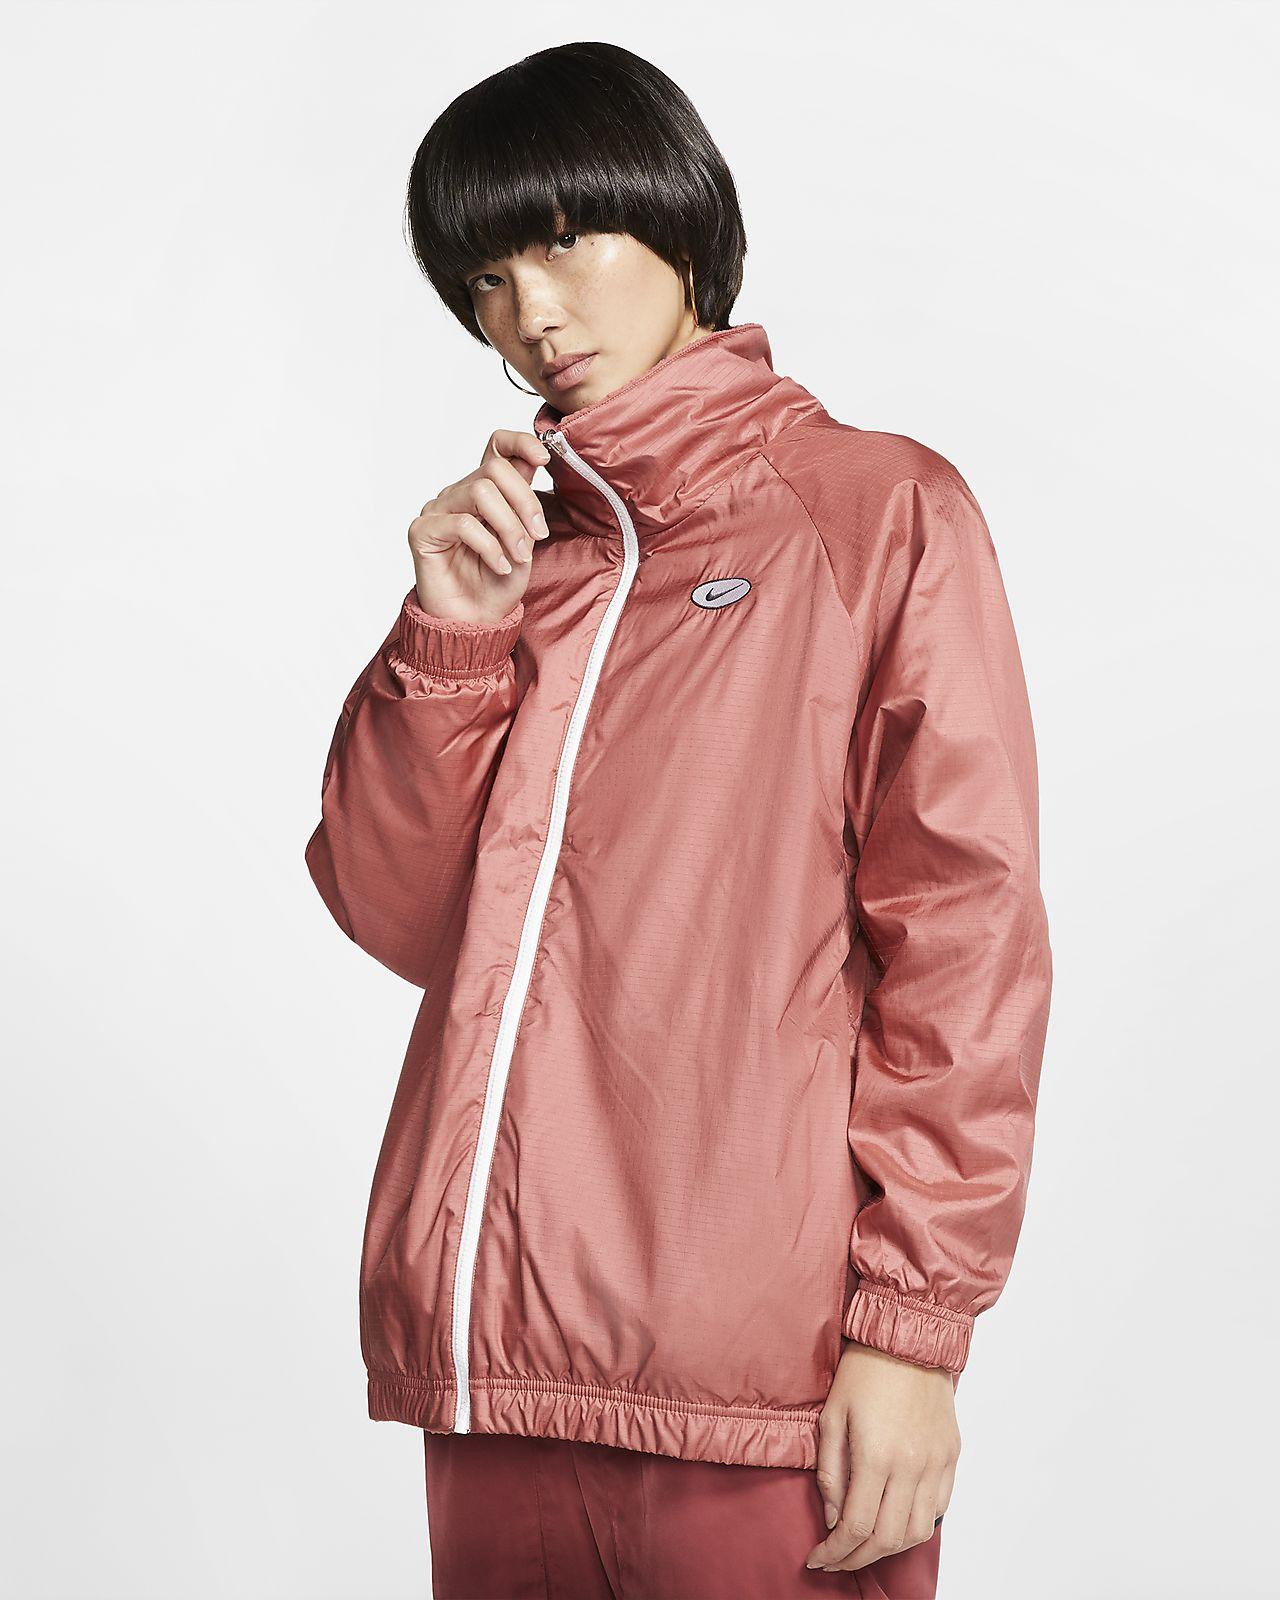 Damenjacke Swoosh Wendbare Nike Sportswear Sherpa CodxBe